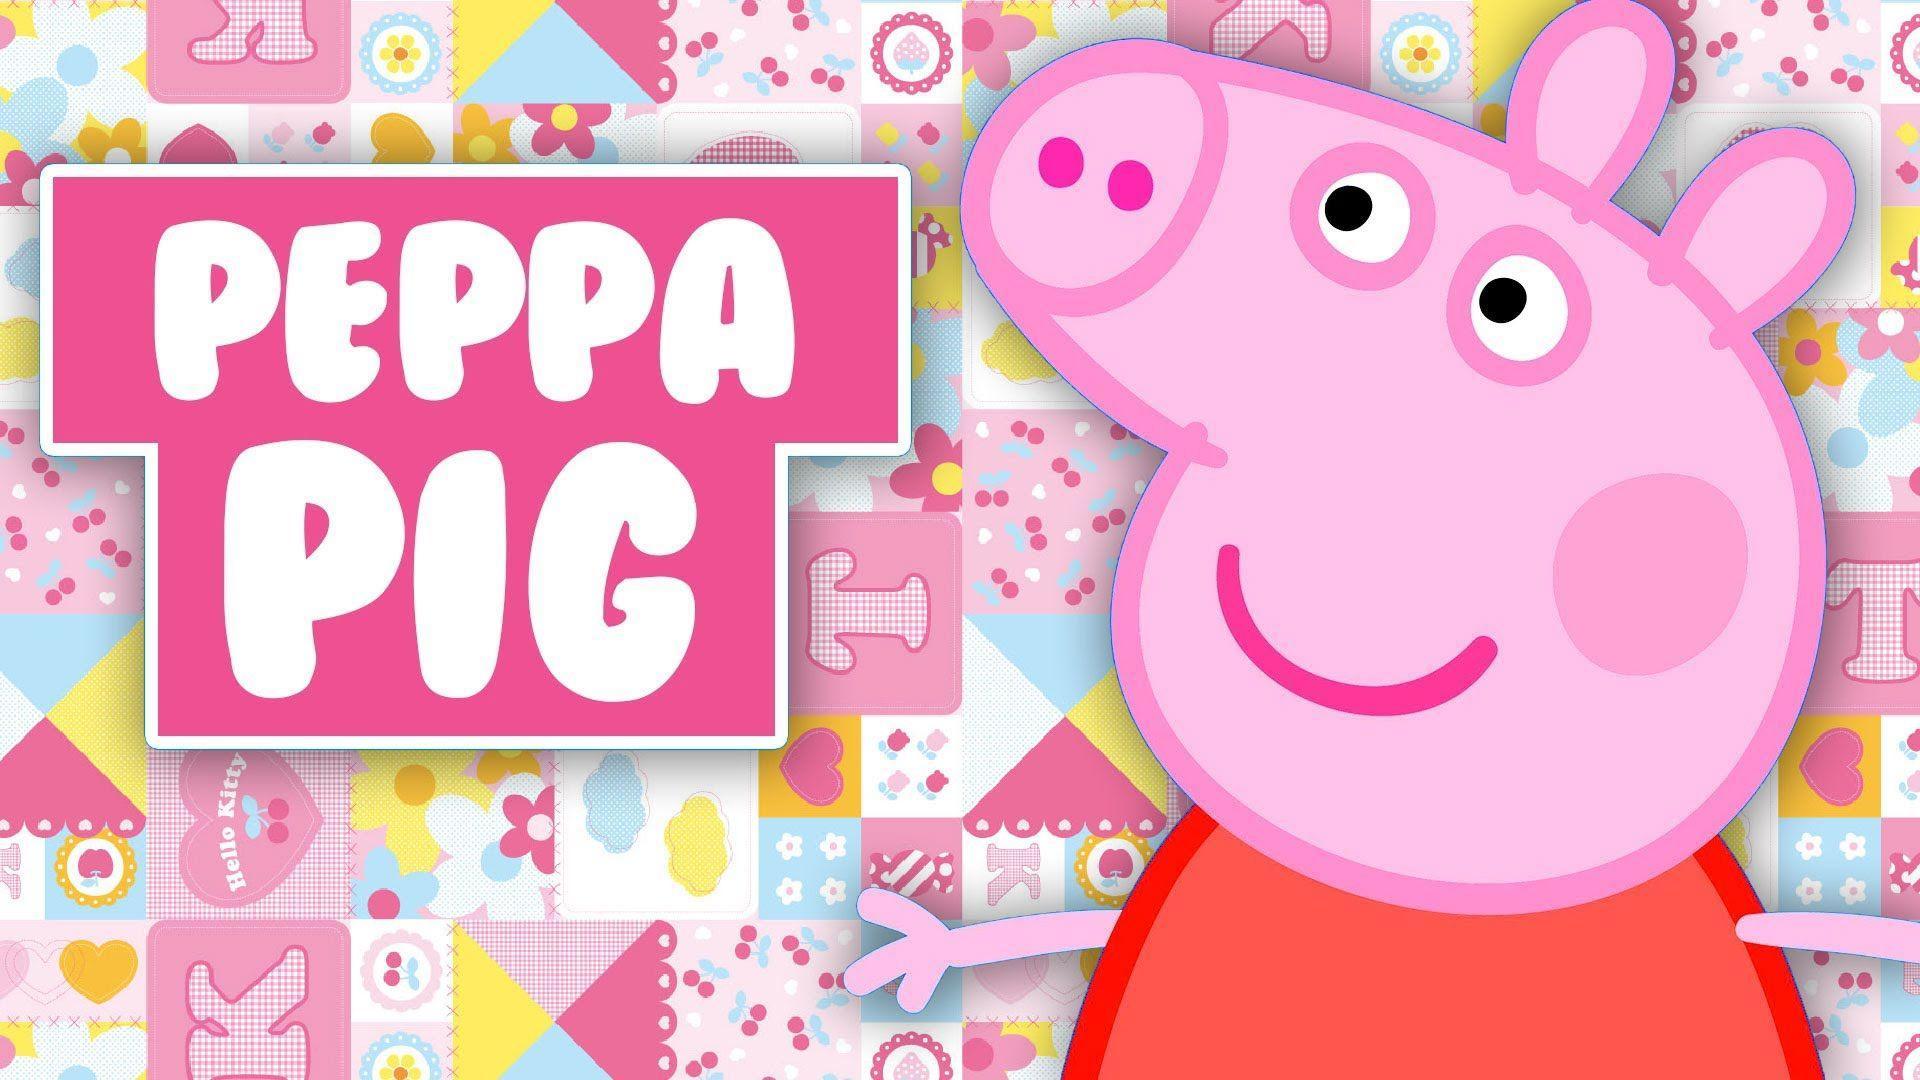 Peppa Pig Pig Wallpaper Peppa Pig Wallpaper Funny Iphone Wallpaper